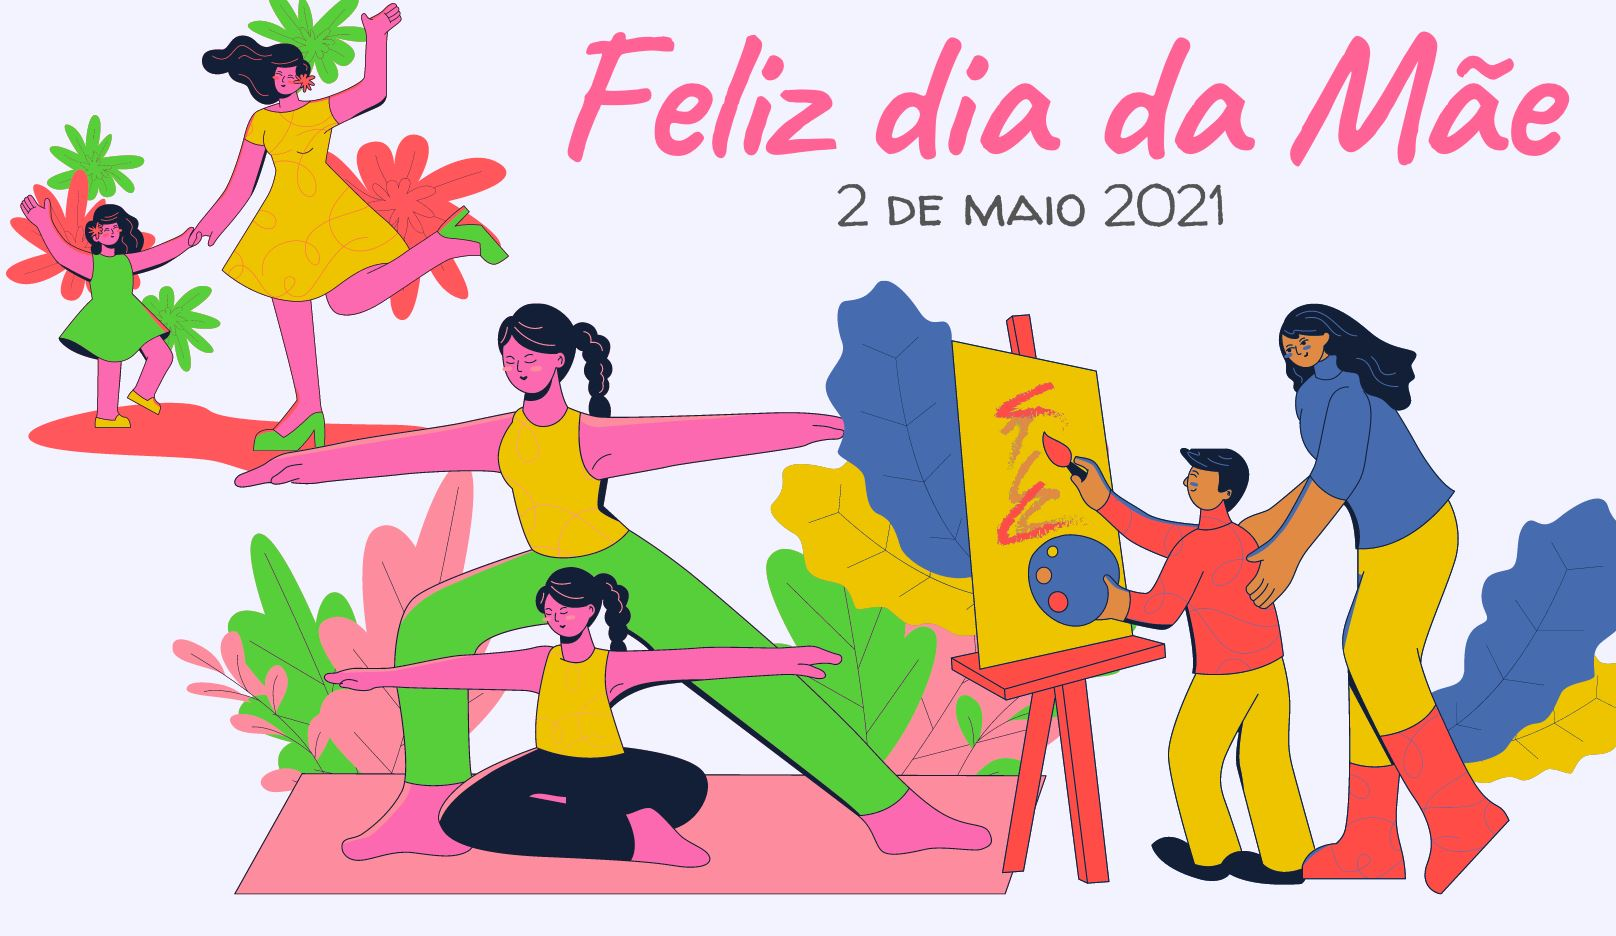 FEIRA DIA DA MÃE _ ONLINE